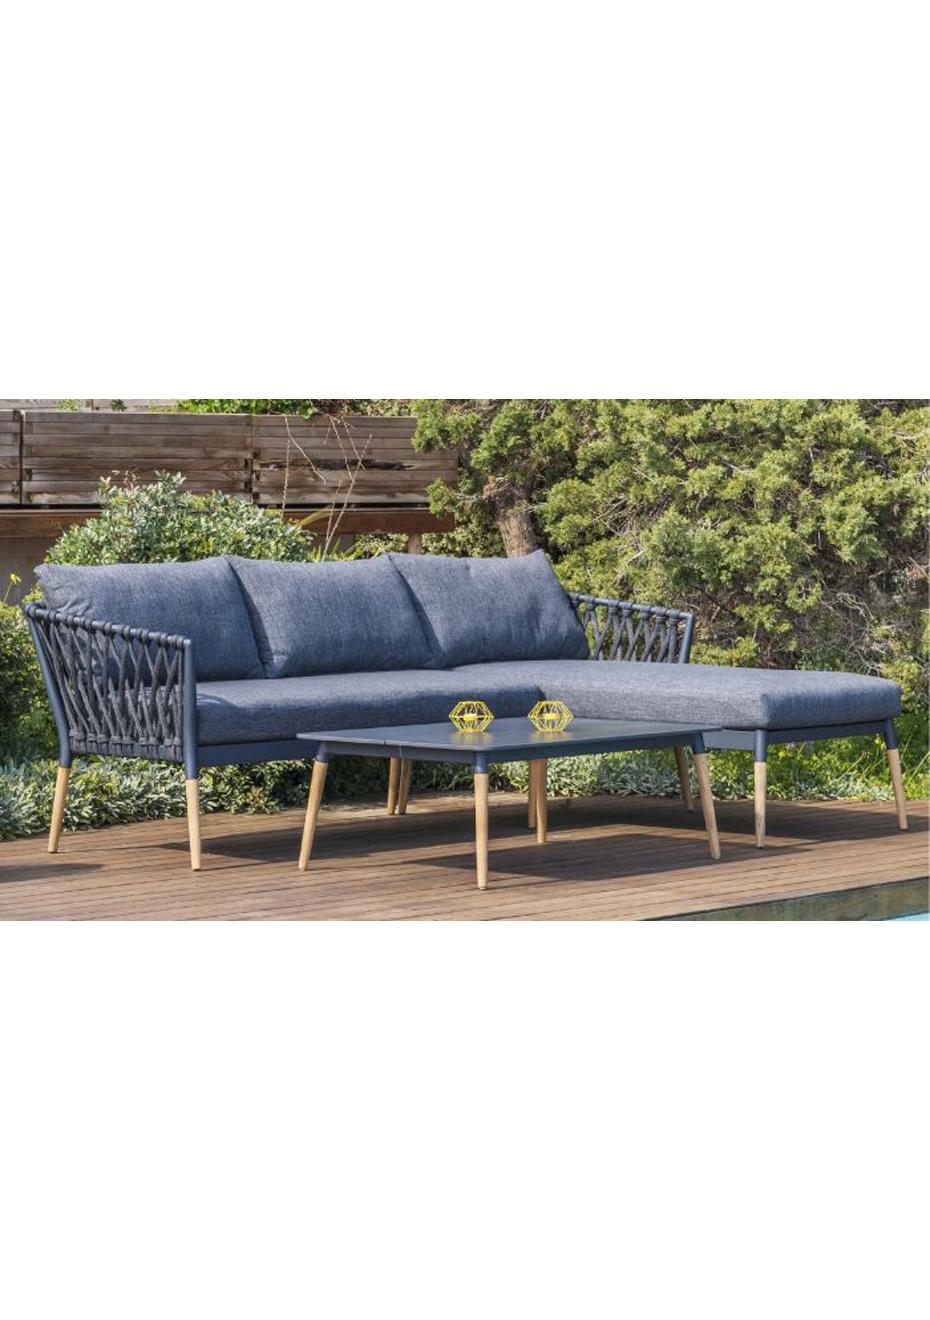 ipanema chaise lounge set charcoal teak